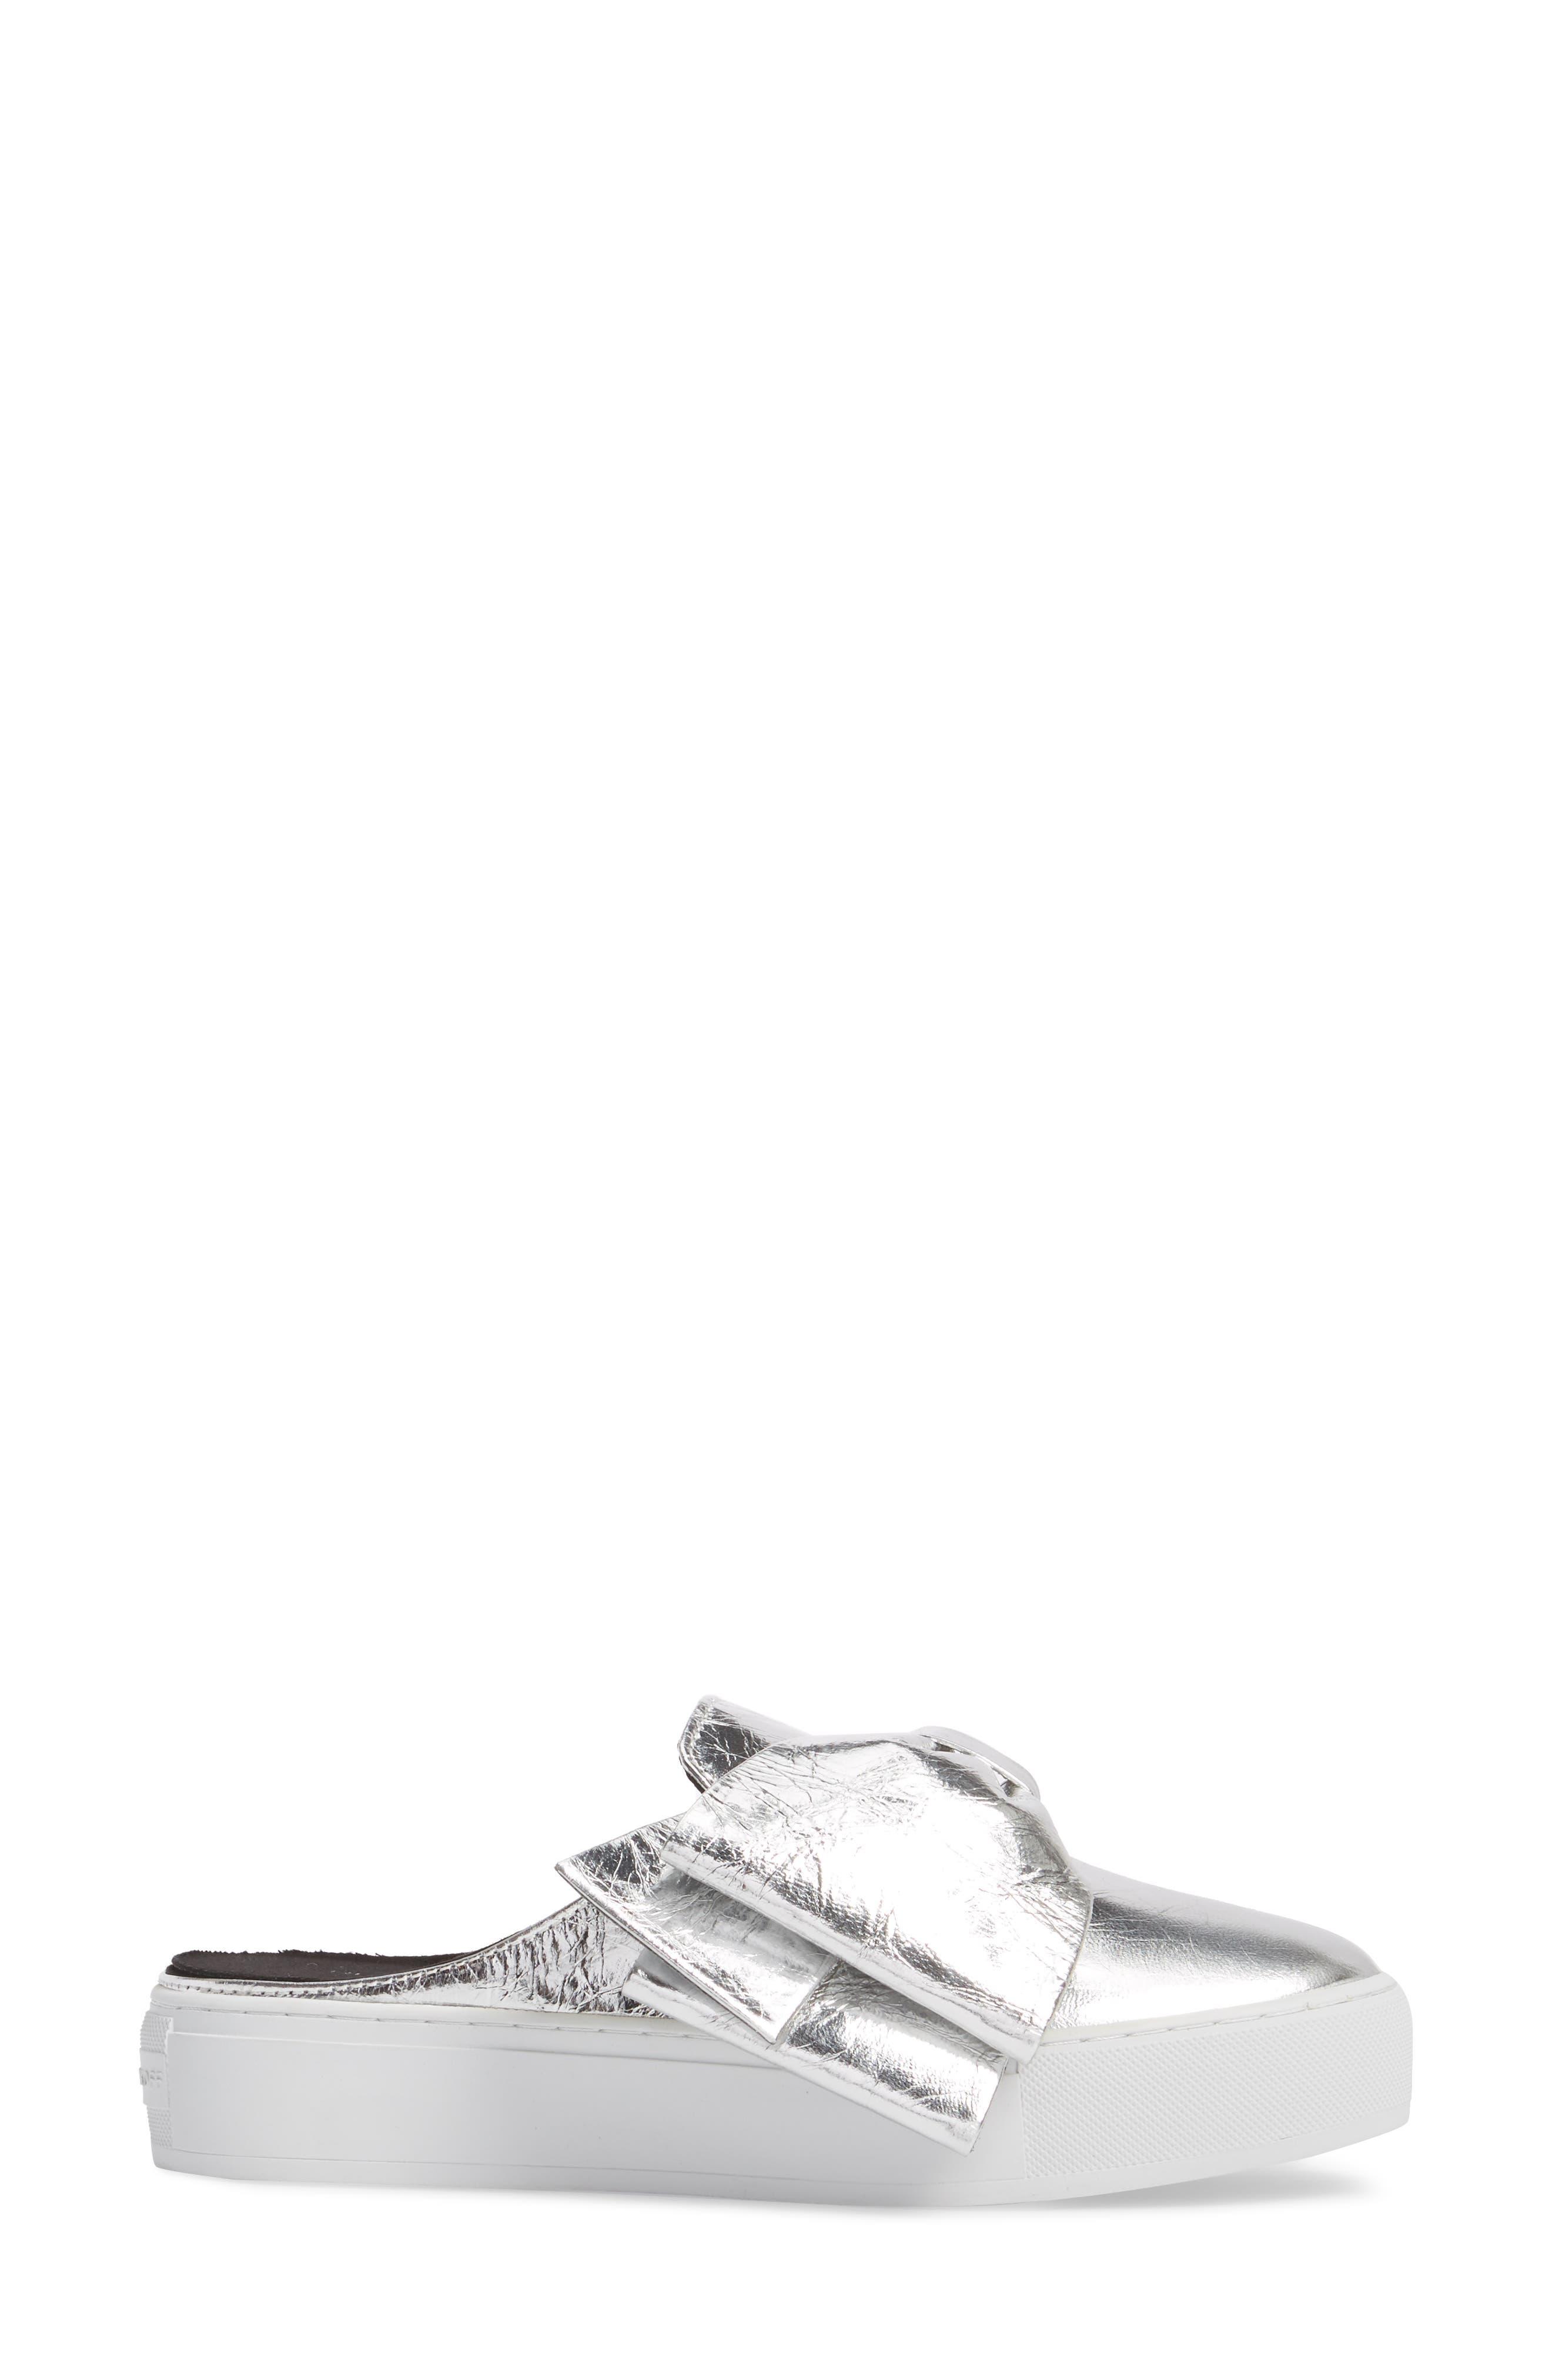 Neva Sneaker Mule,                             Alternate thumbnail 8, color,